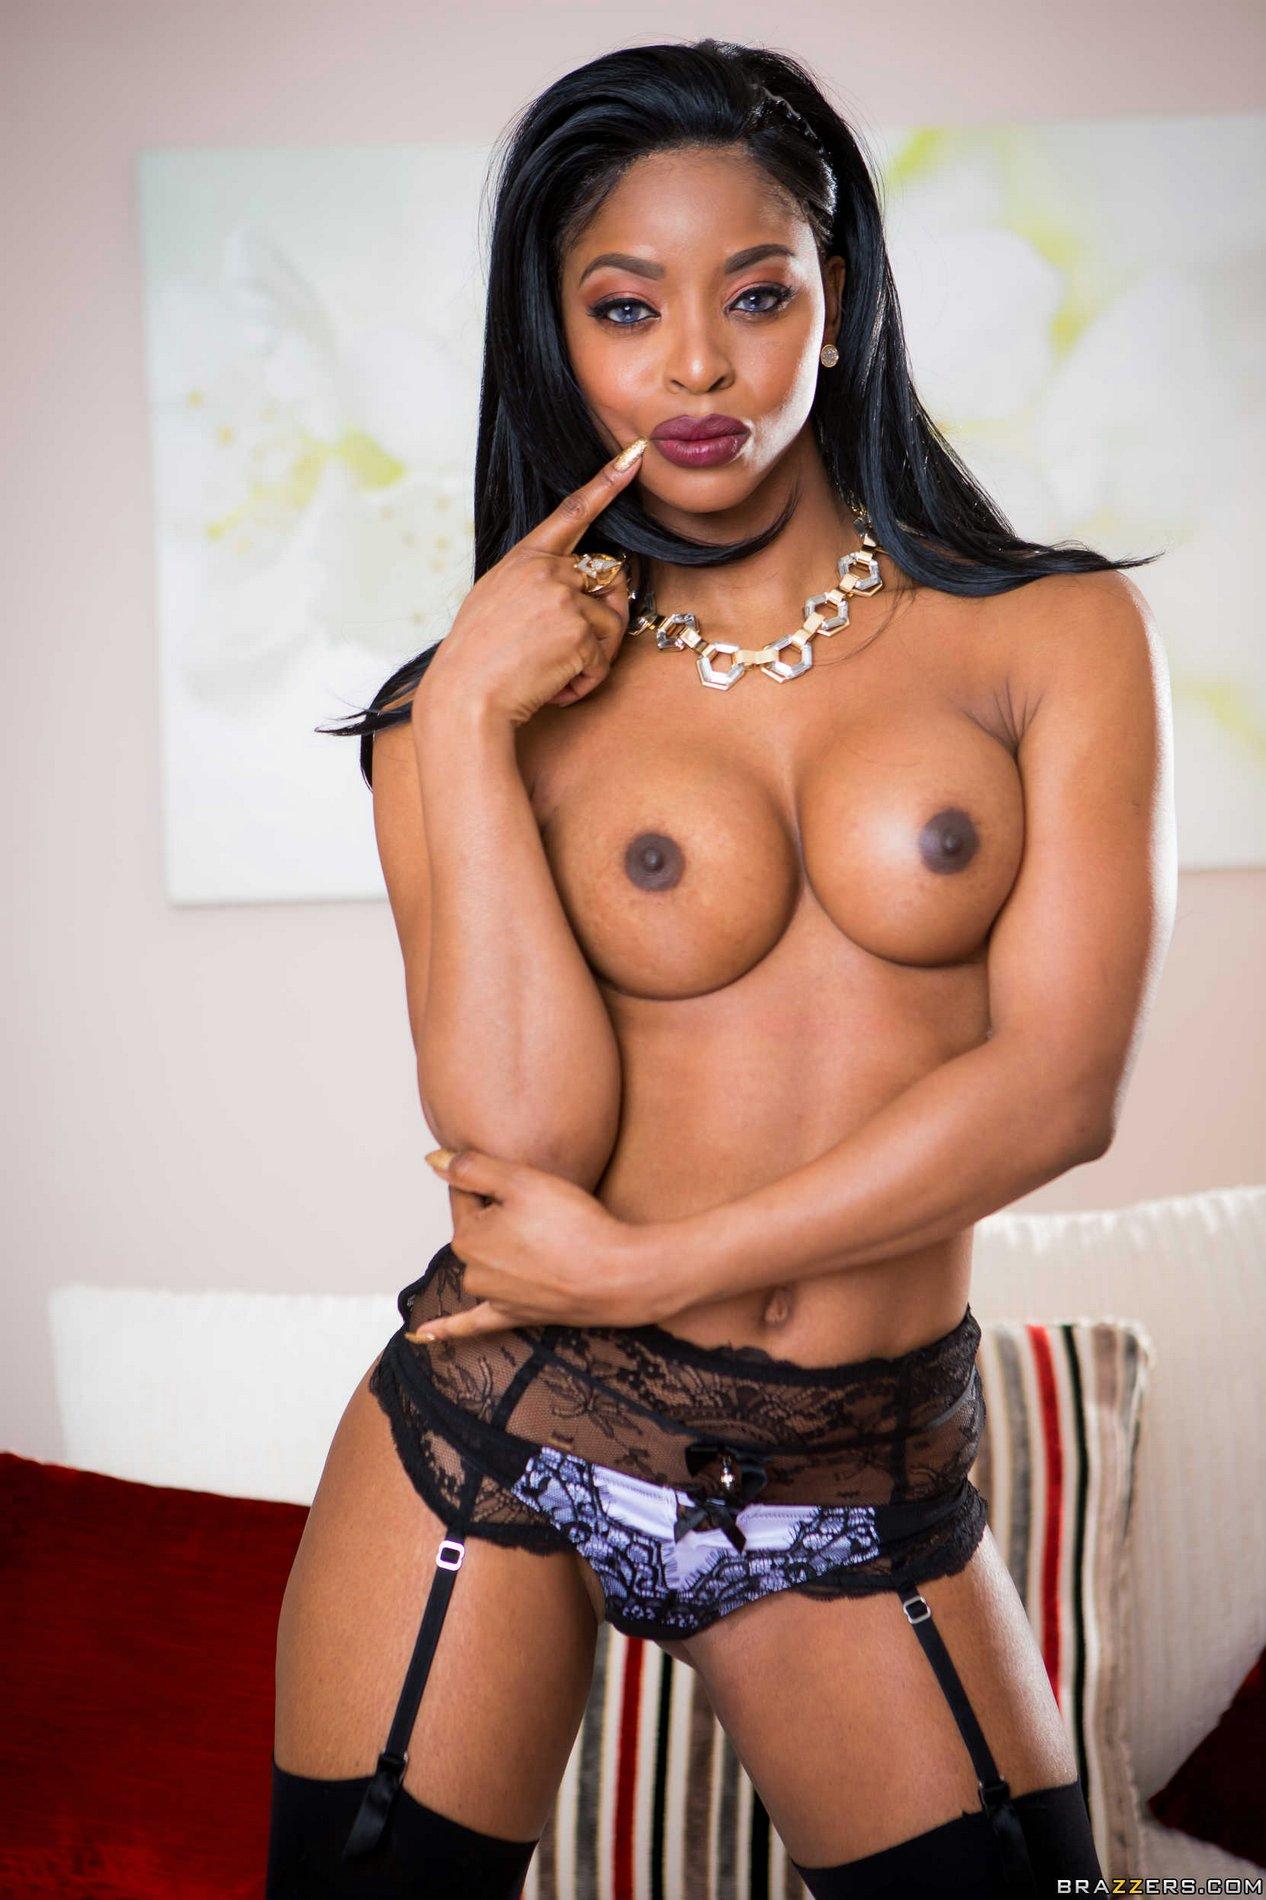 Jasmine pornstar